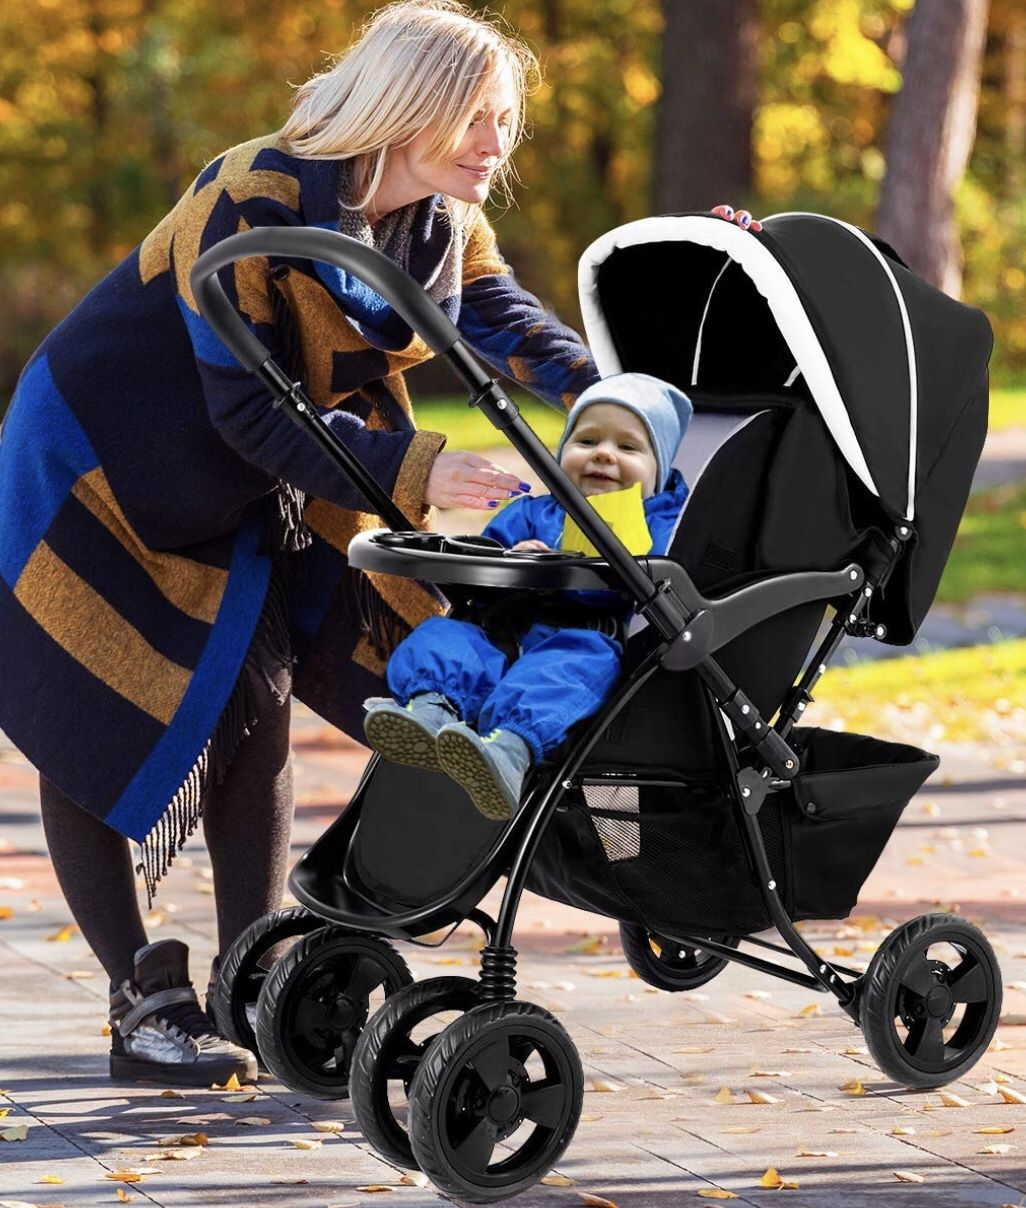 Top Five Best Strollers Under 100.00 Baby strollers